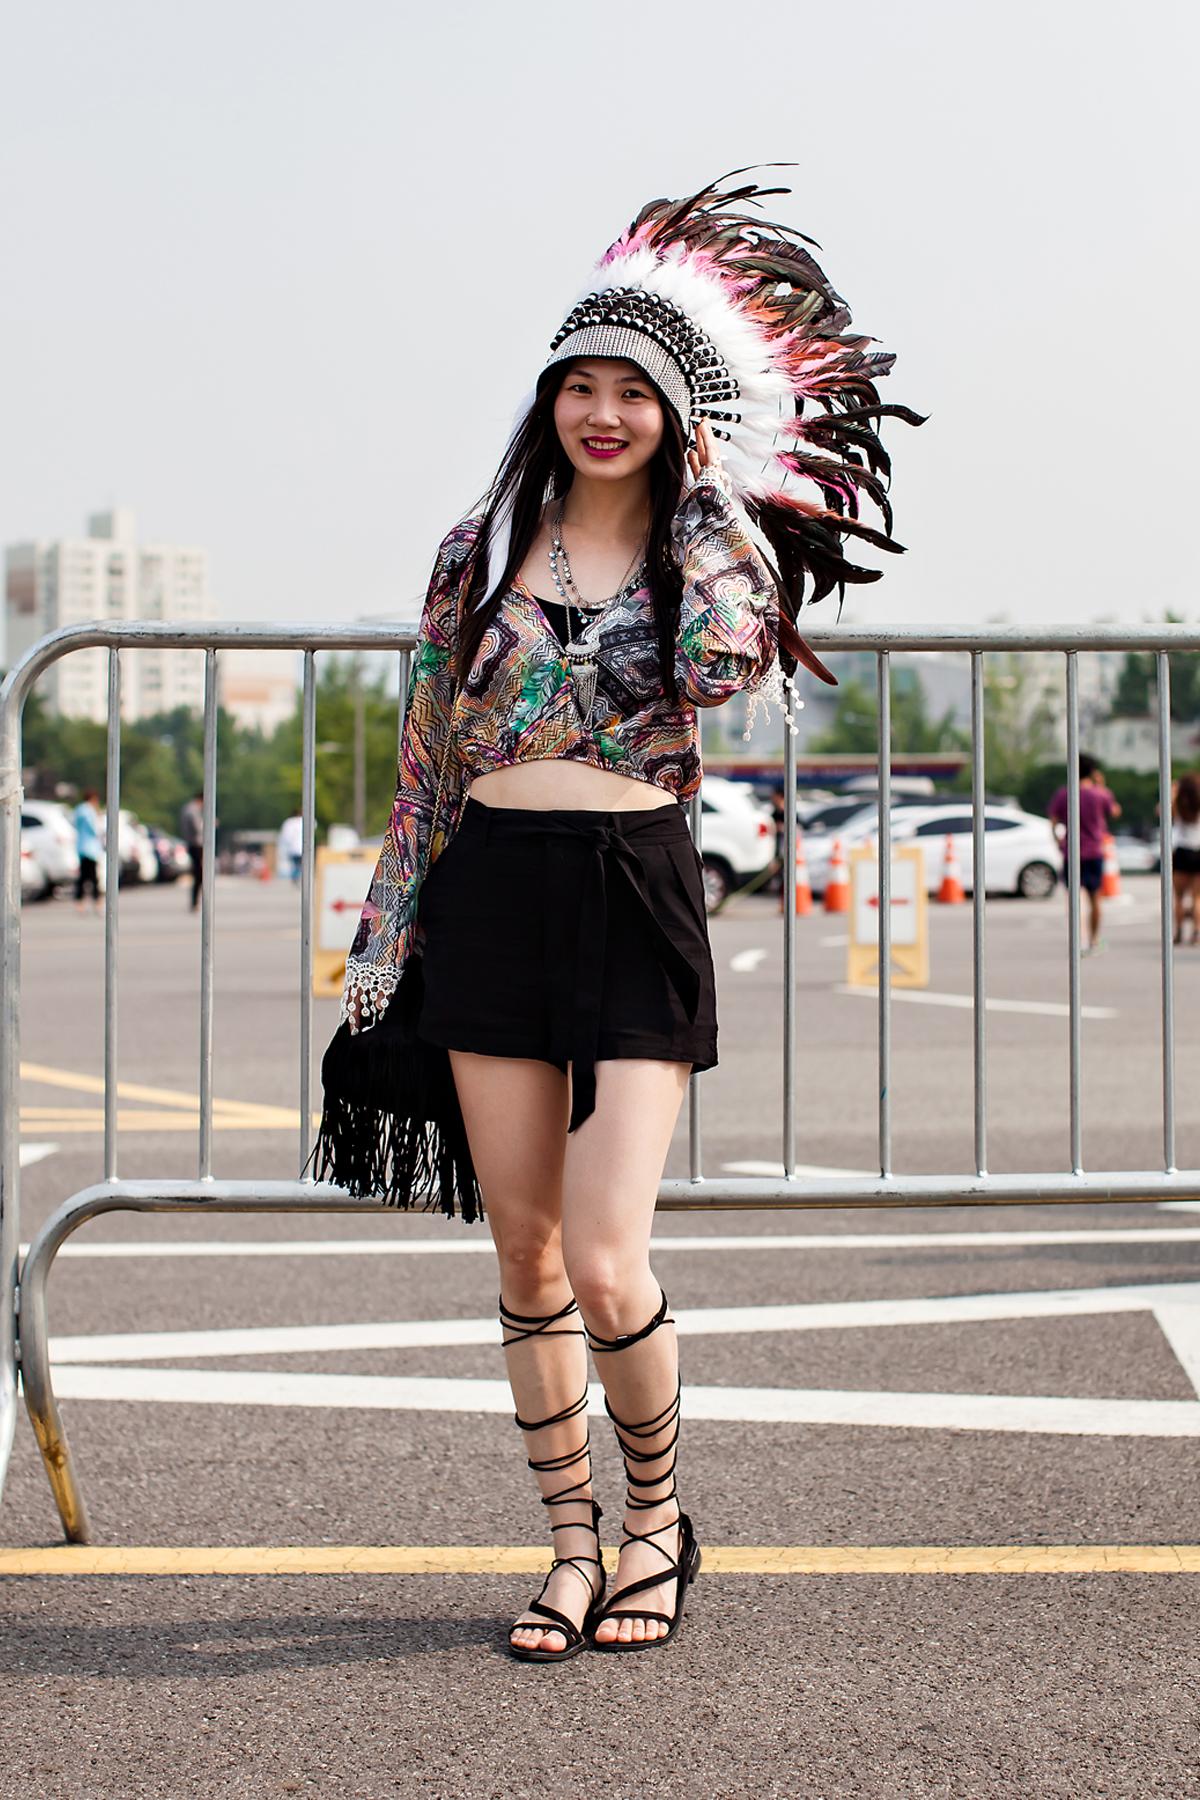 Giselli, ULTRA MUSIC FESTIVAL KOREA 2016